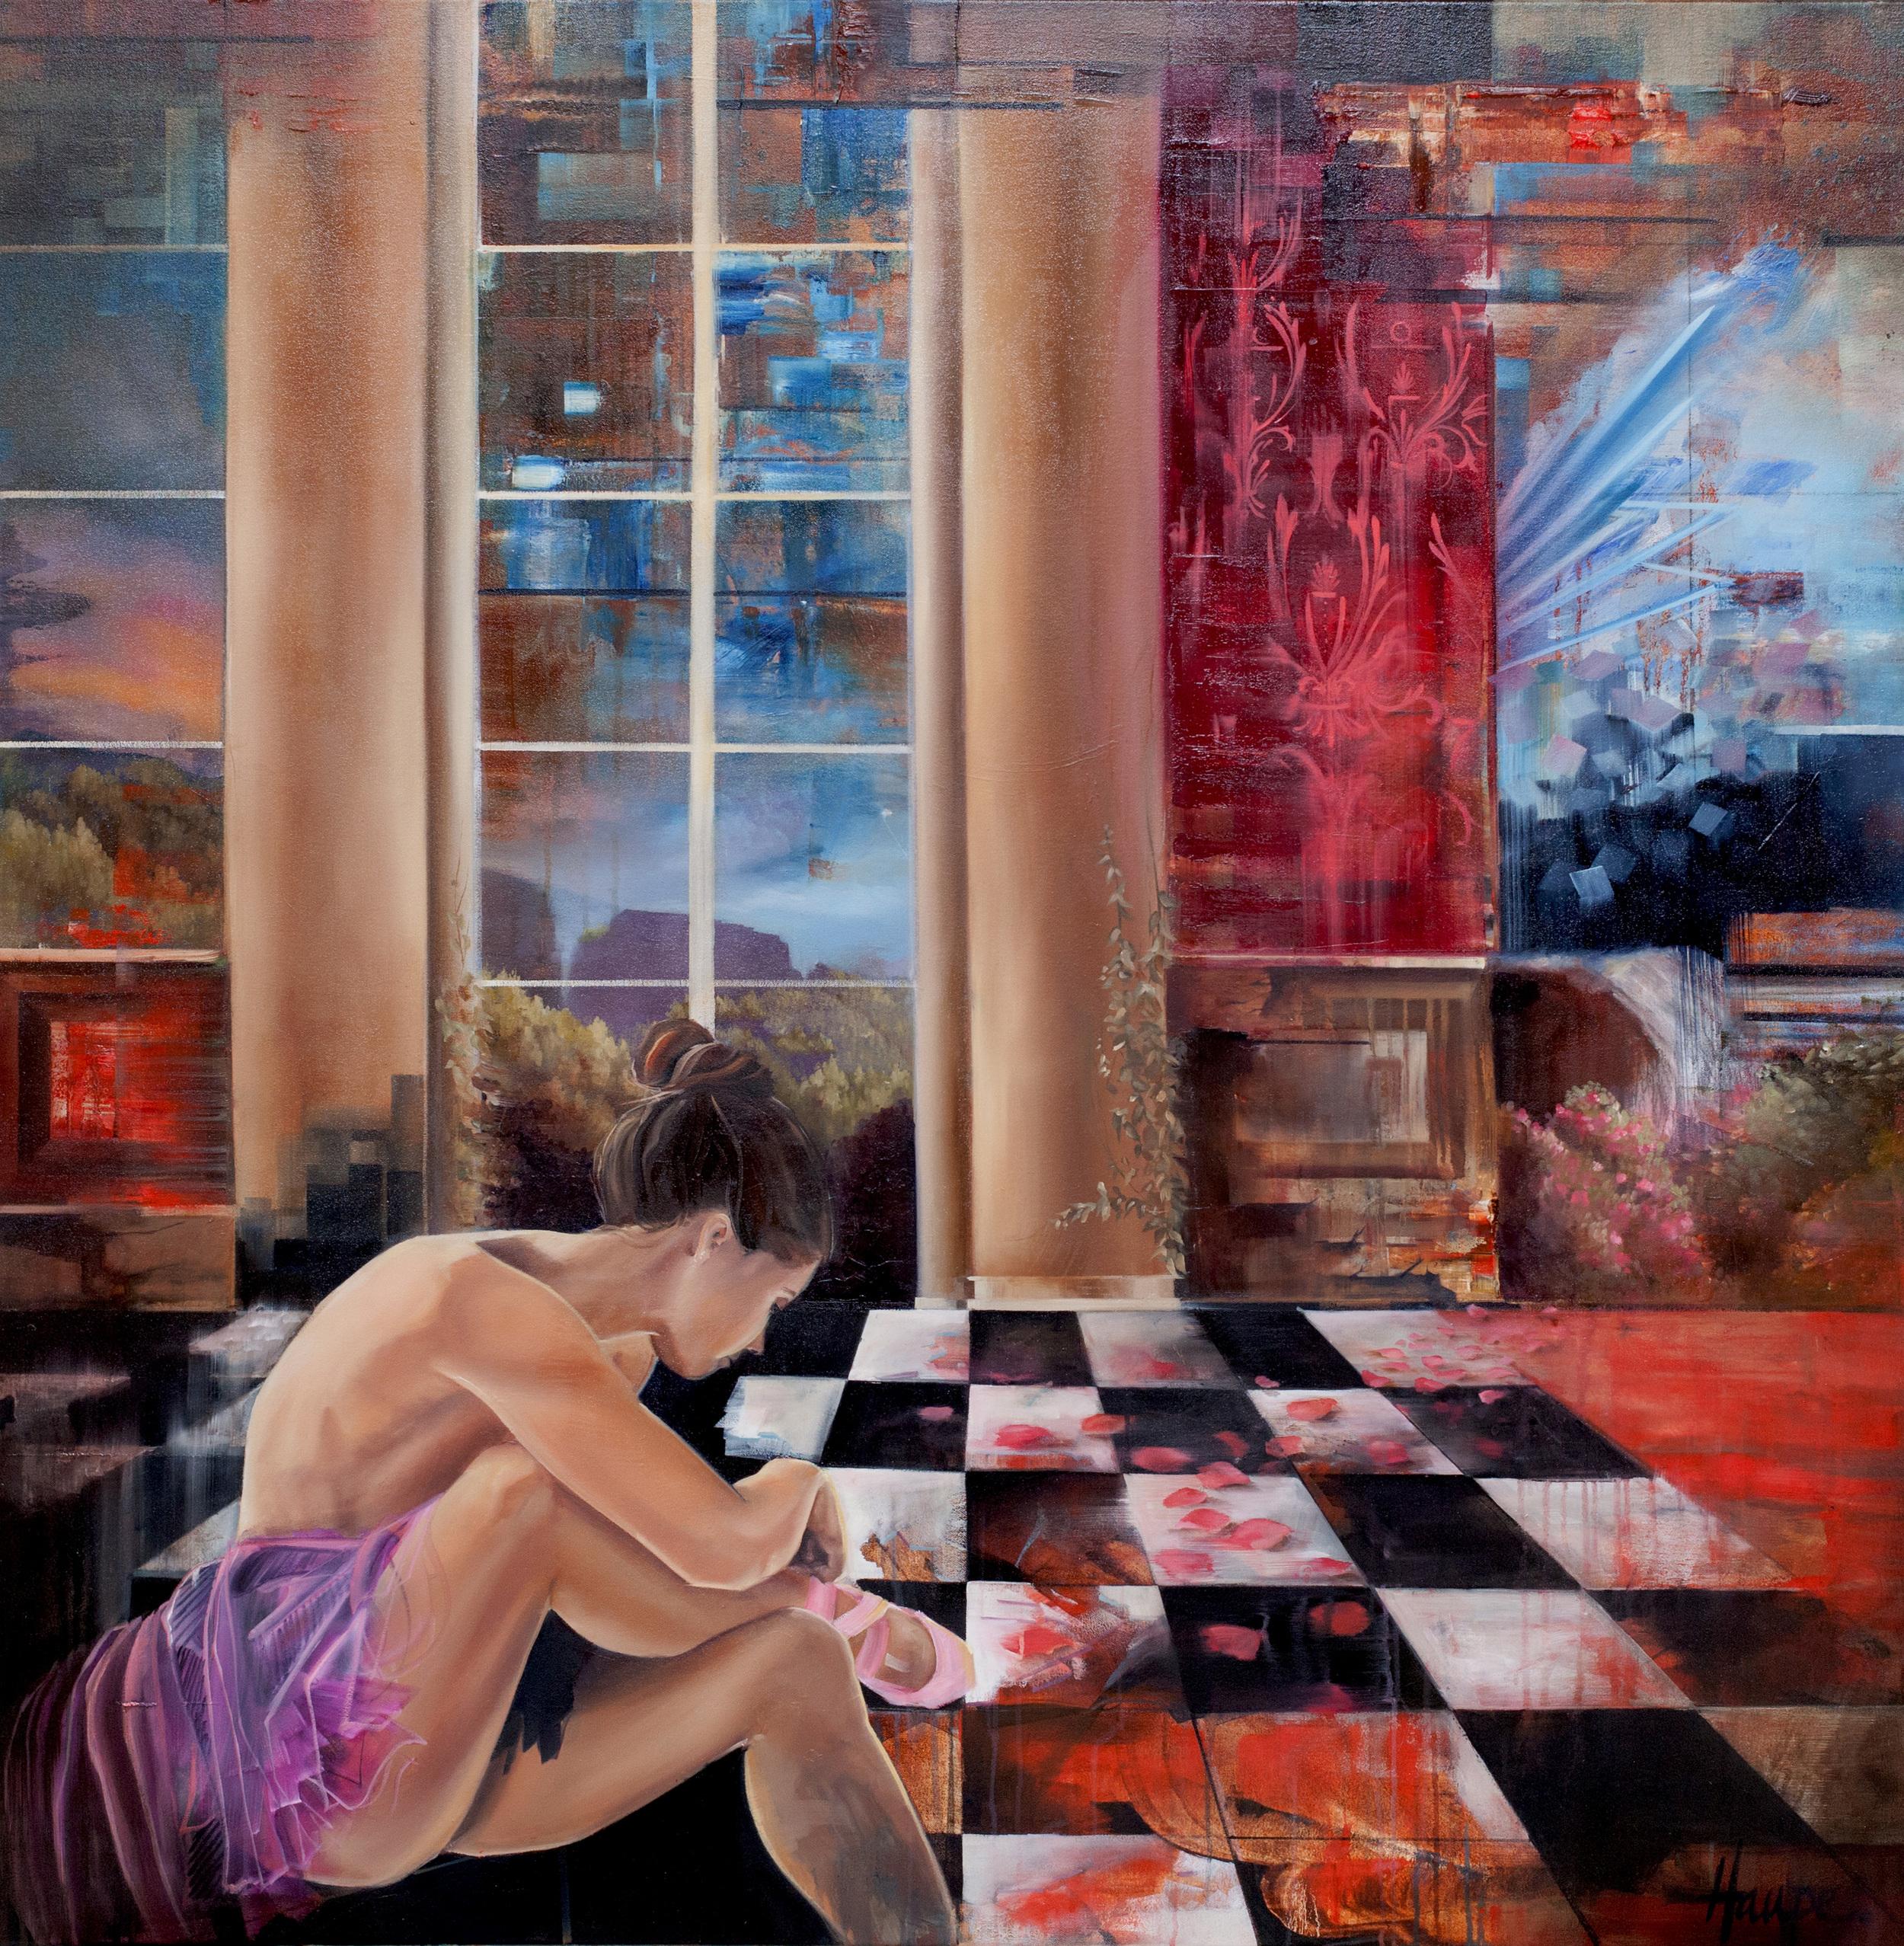 "|Oil on Canvas||48"" x 48""||2016|"